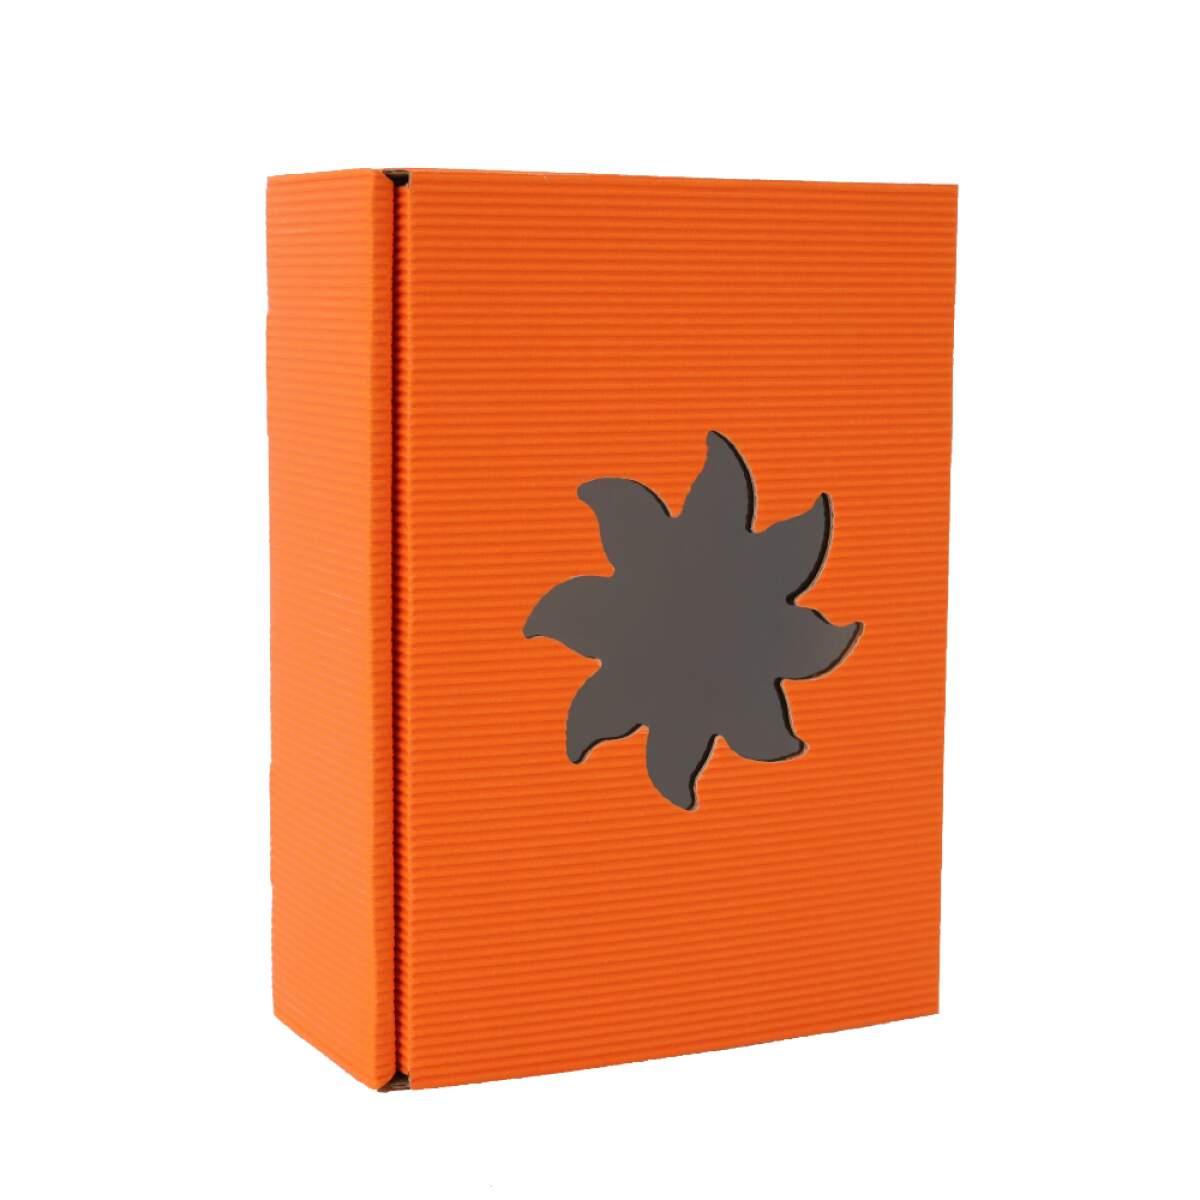 Box-Gr-M-m-Sonne-orange_2100_1000px